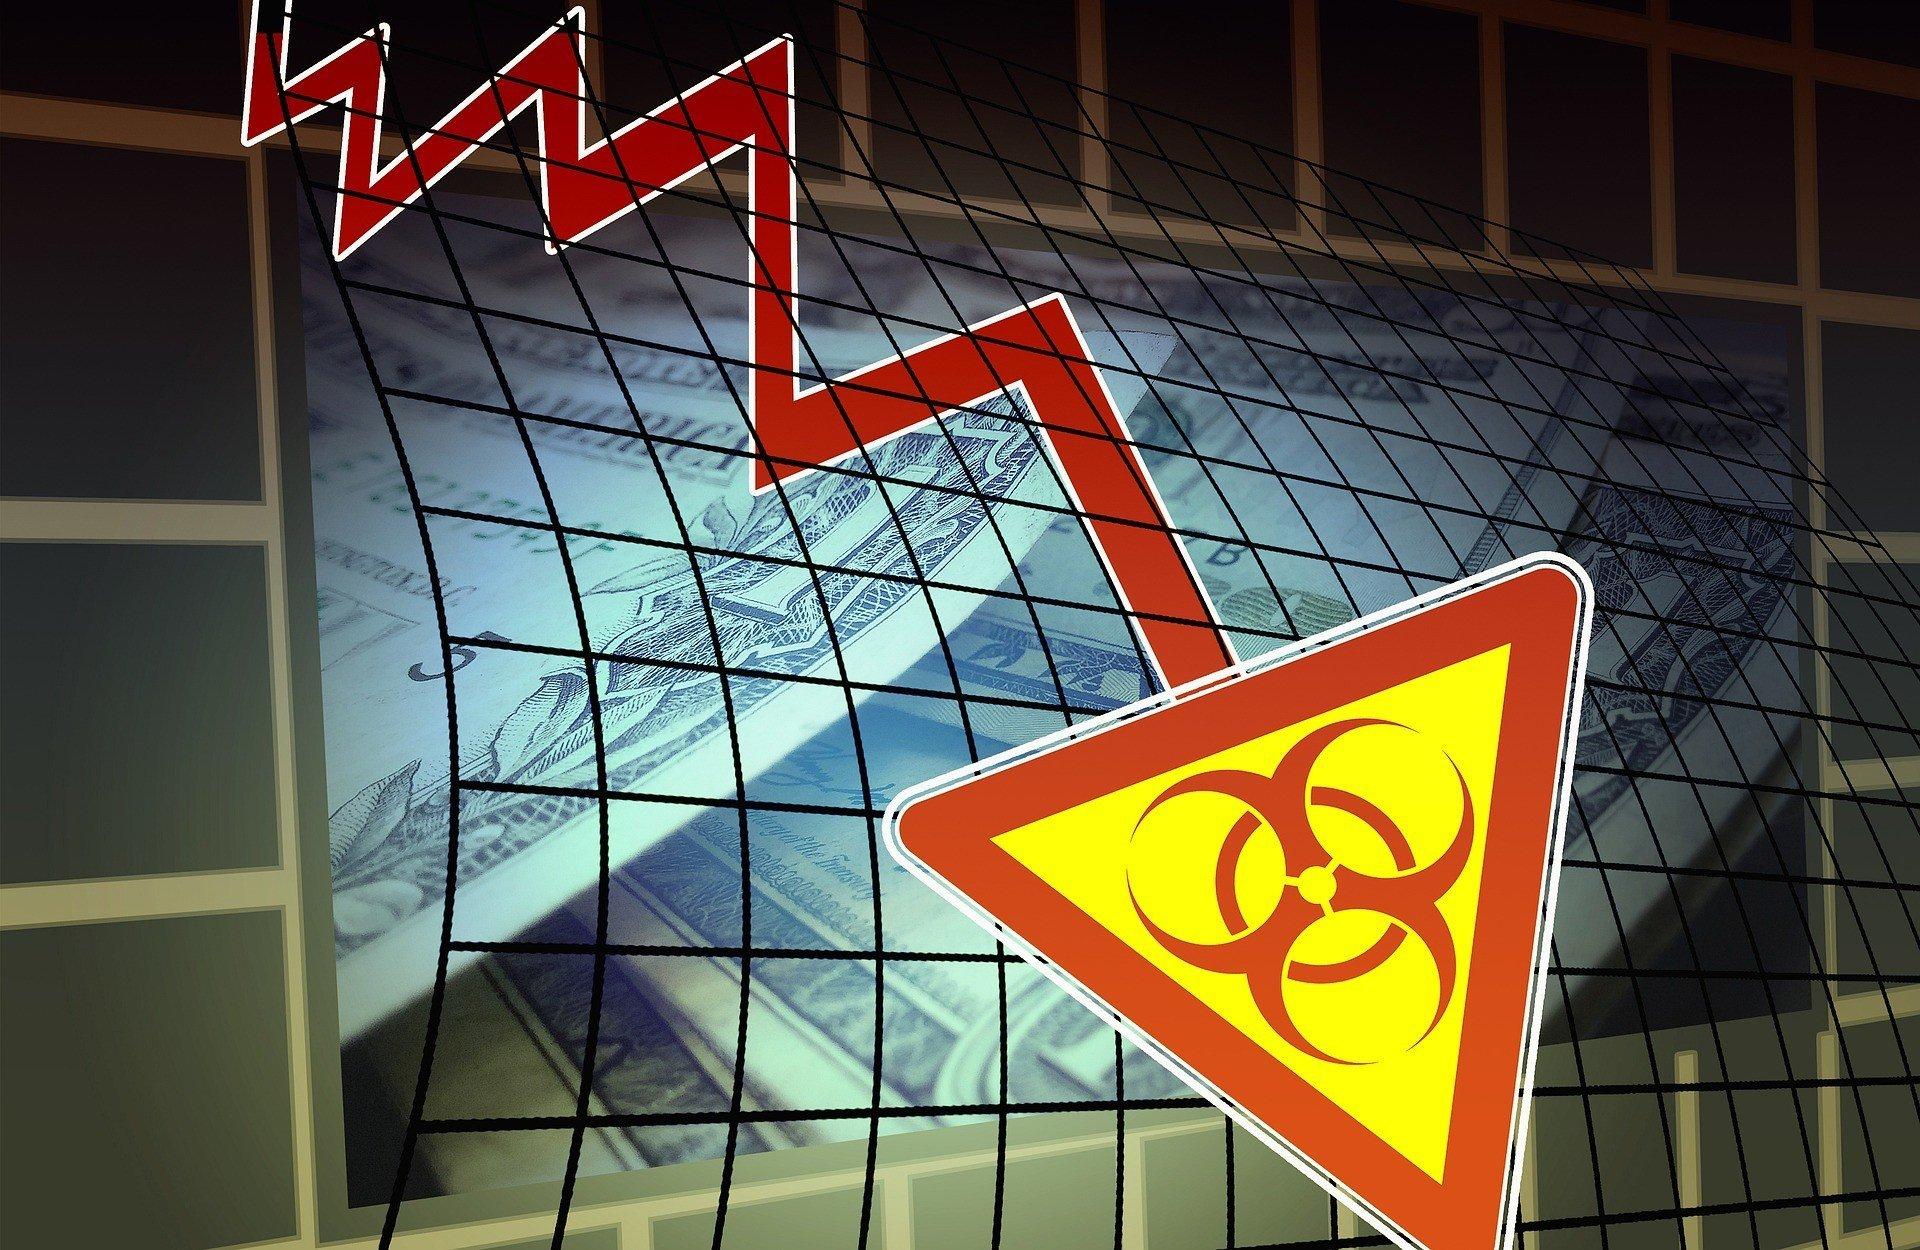 Энергетические инвестиции рекордно упали